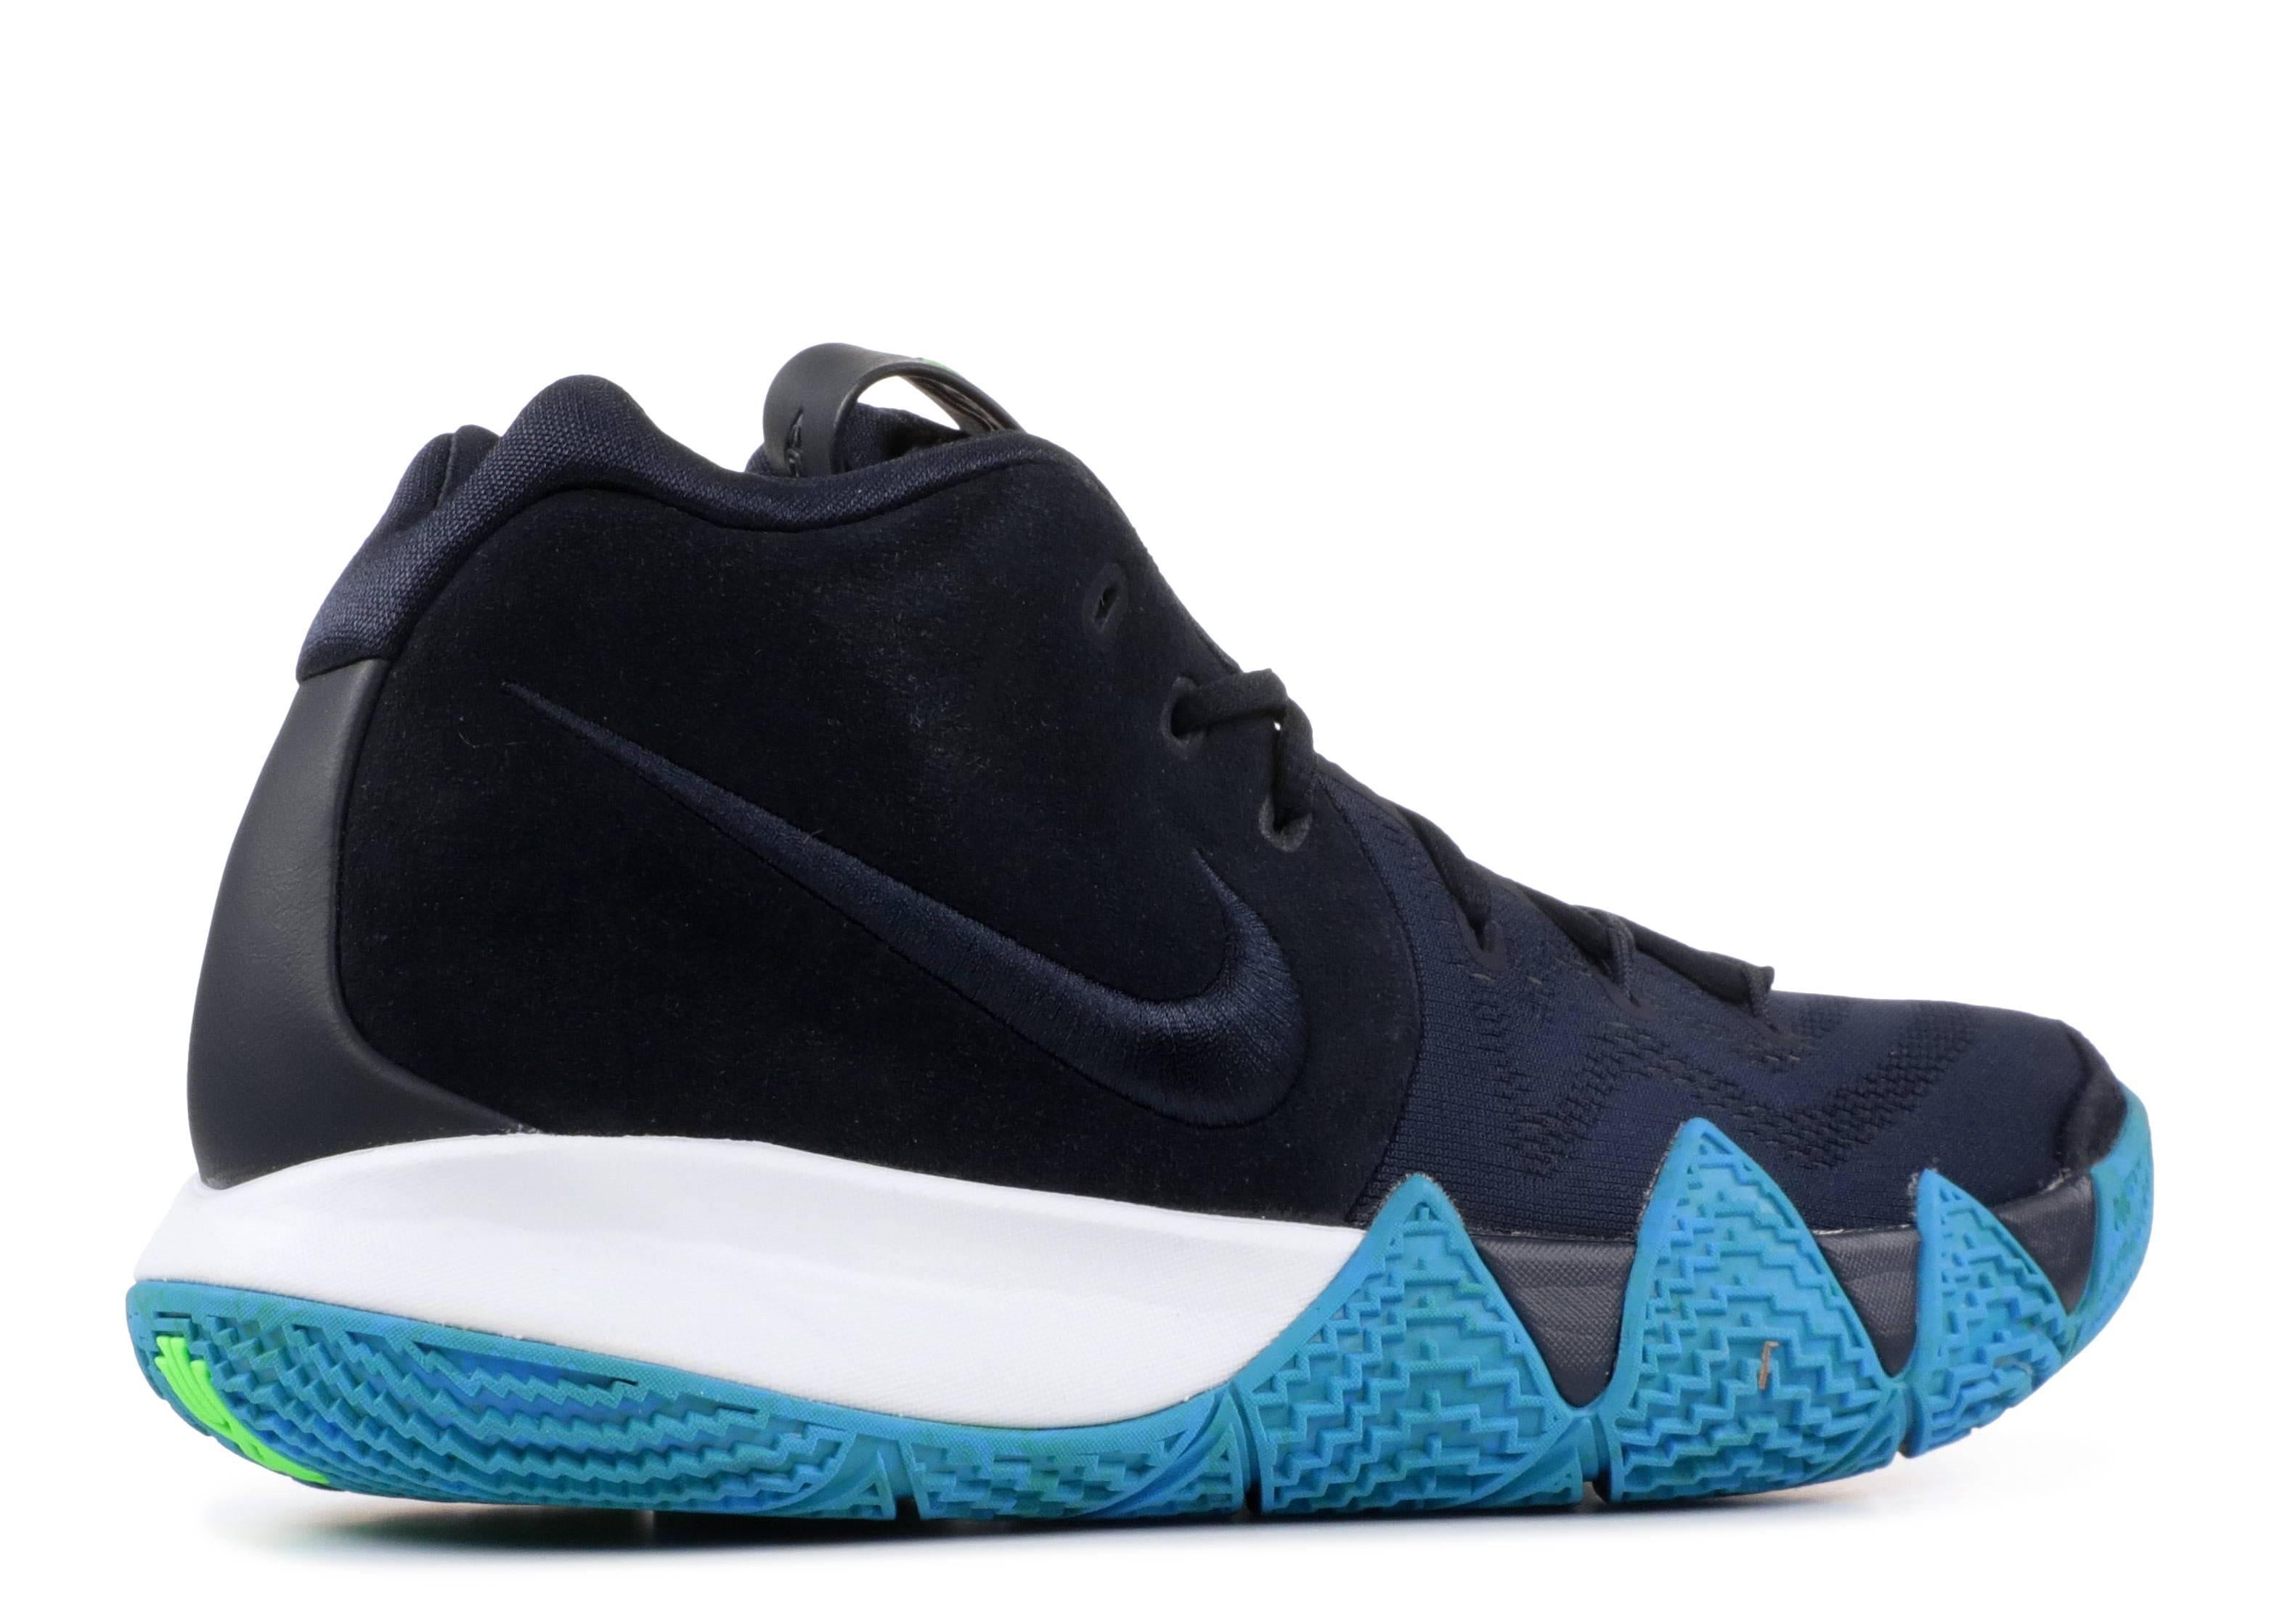 official photos f1e18 ba8ed Kyrie 4 - Nike - 943806 401 - dark obsidian black   Flight Club